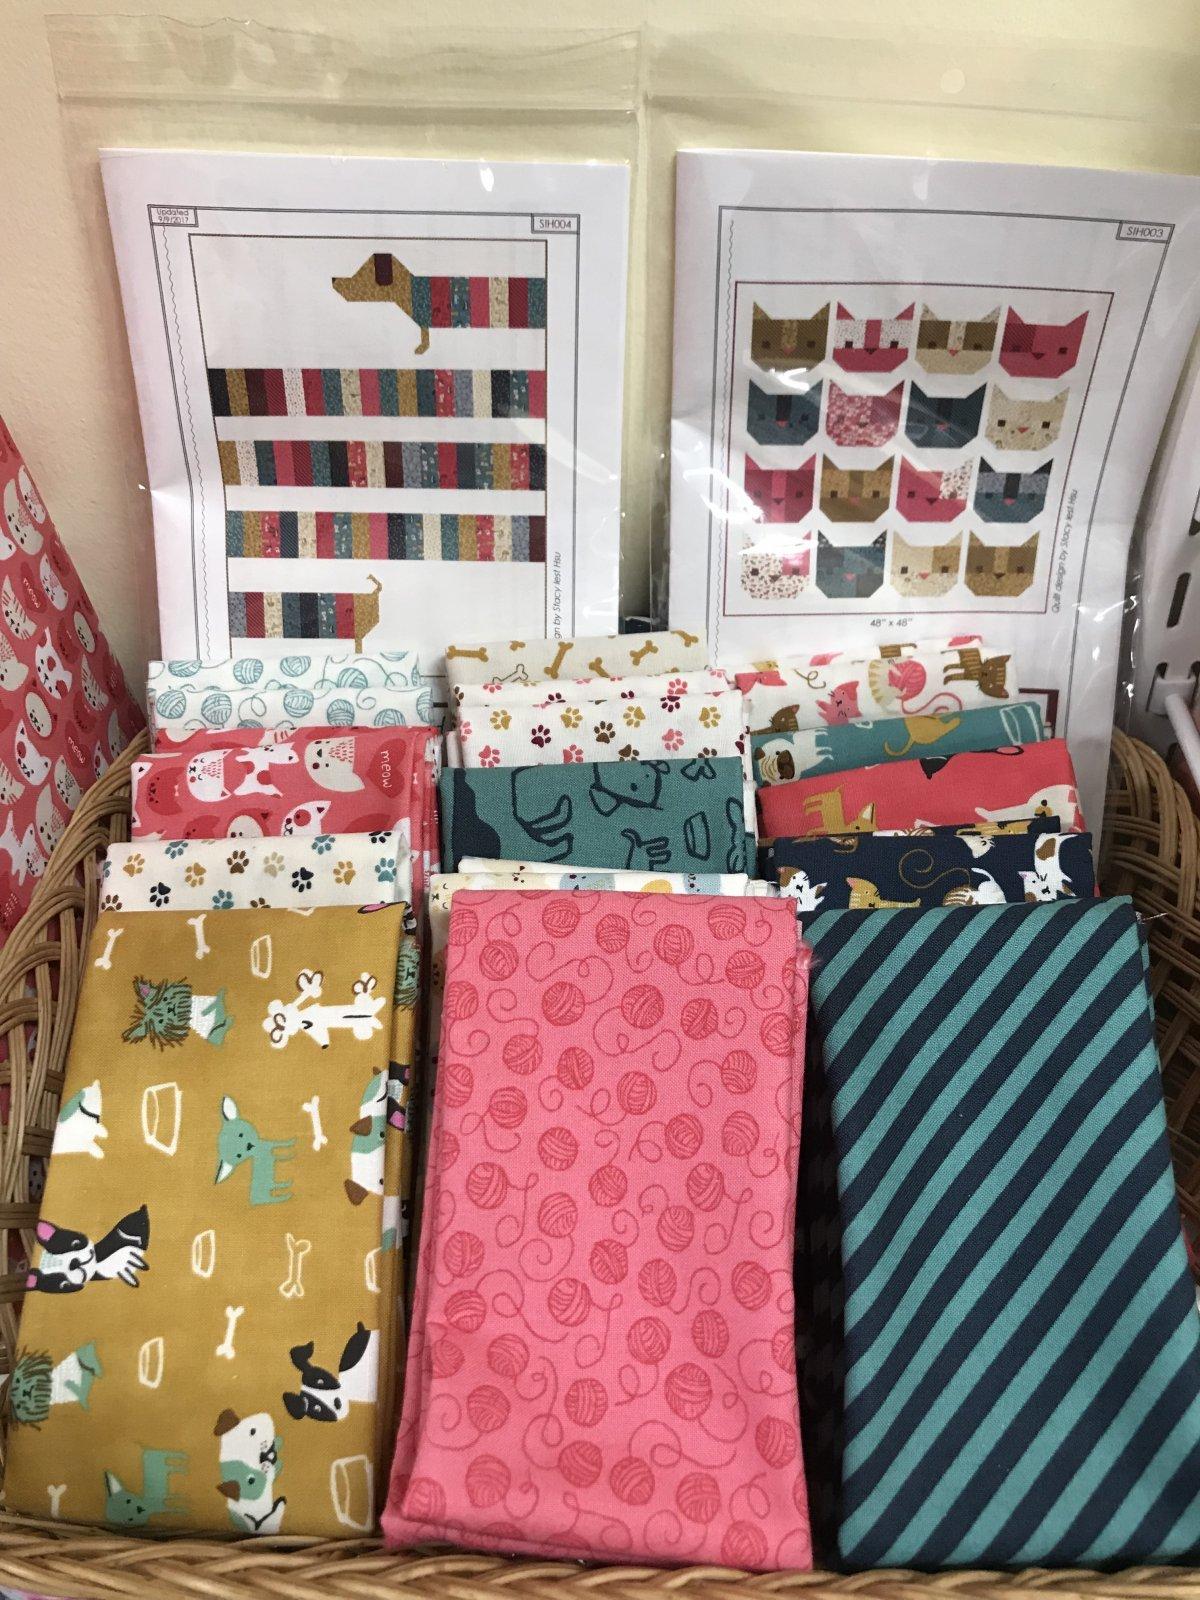 Kay's Quilt Shop, Fort Myers Florida. Southwest Florida's newest ... : quilt shops in fort myers florida - Adamdwight.com